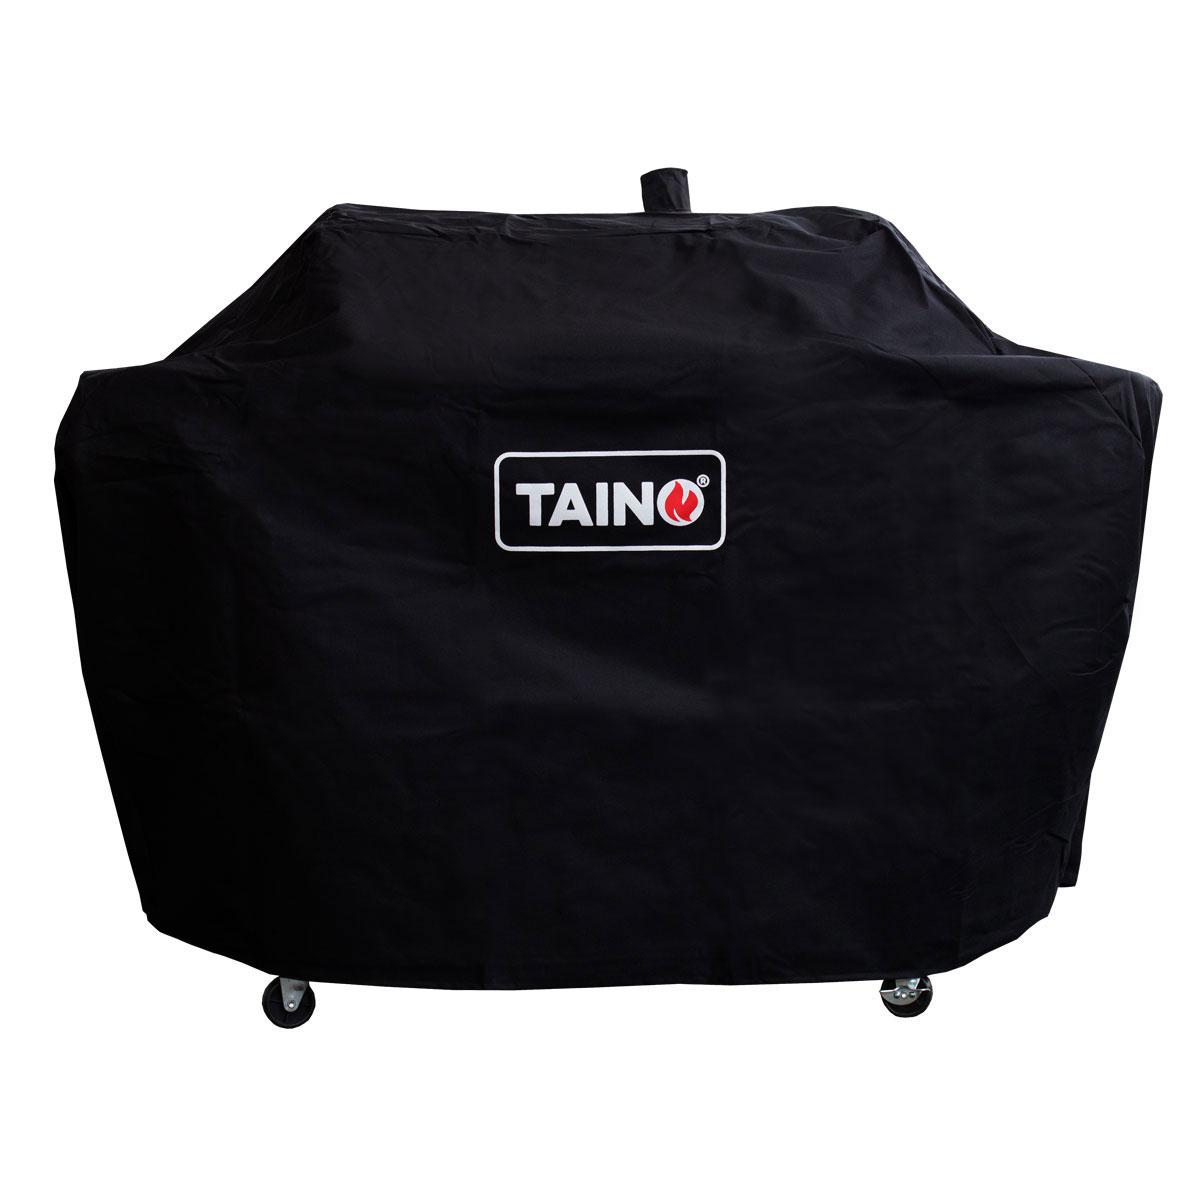 98887 Abdeckung TAINO HERO DUO